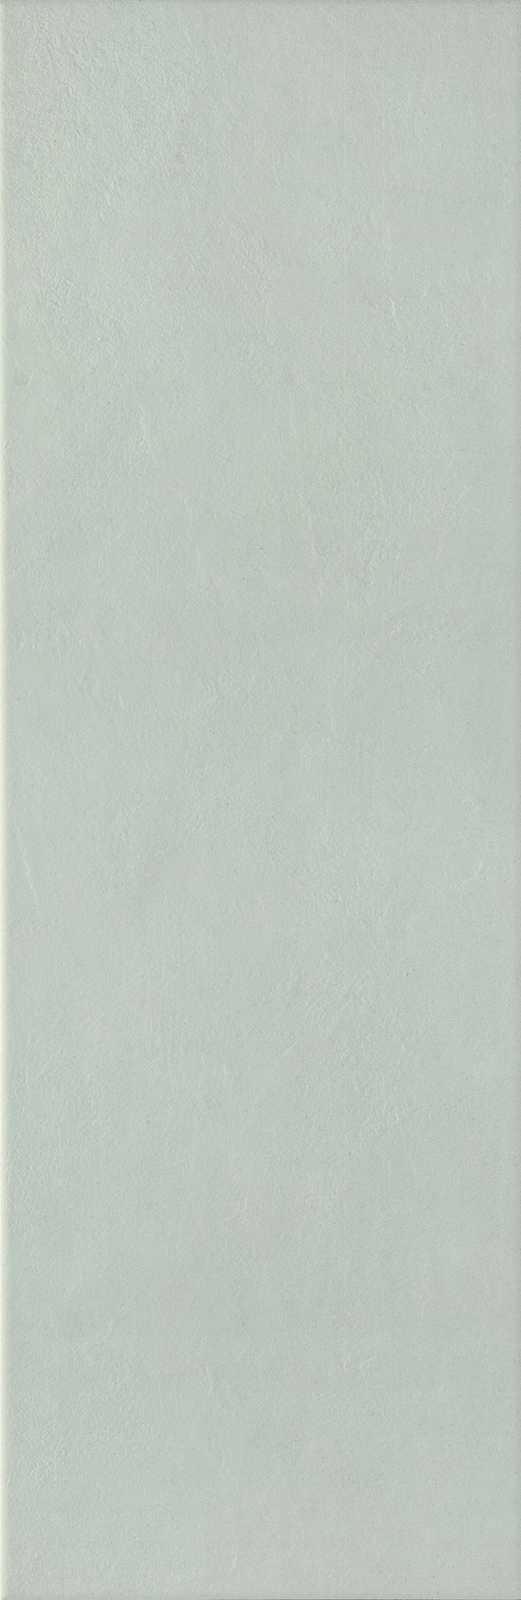 CHALK  250X760 GREY - (Euro/Mq 21,66)